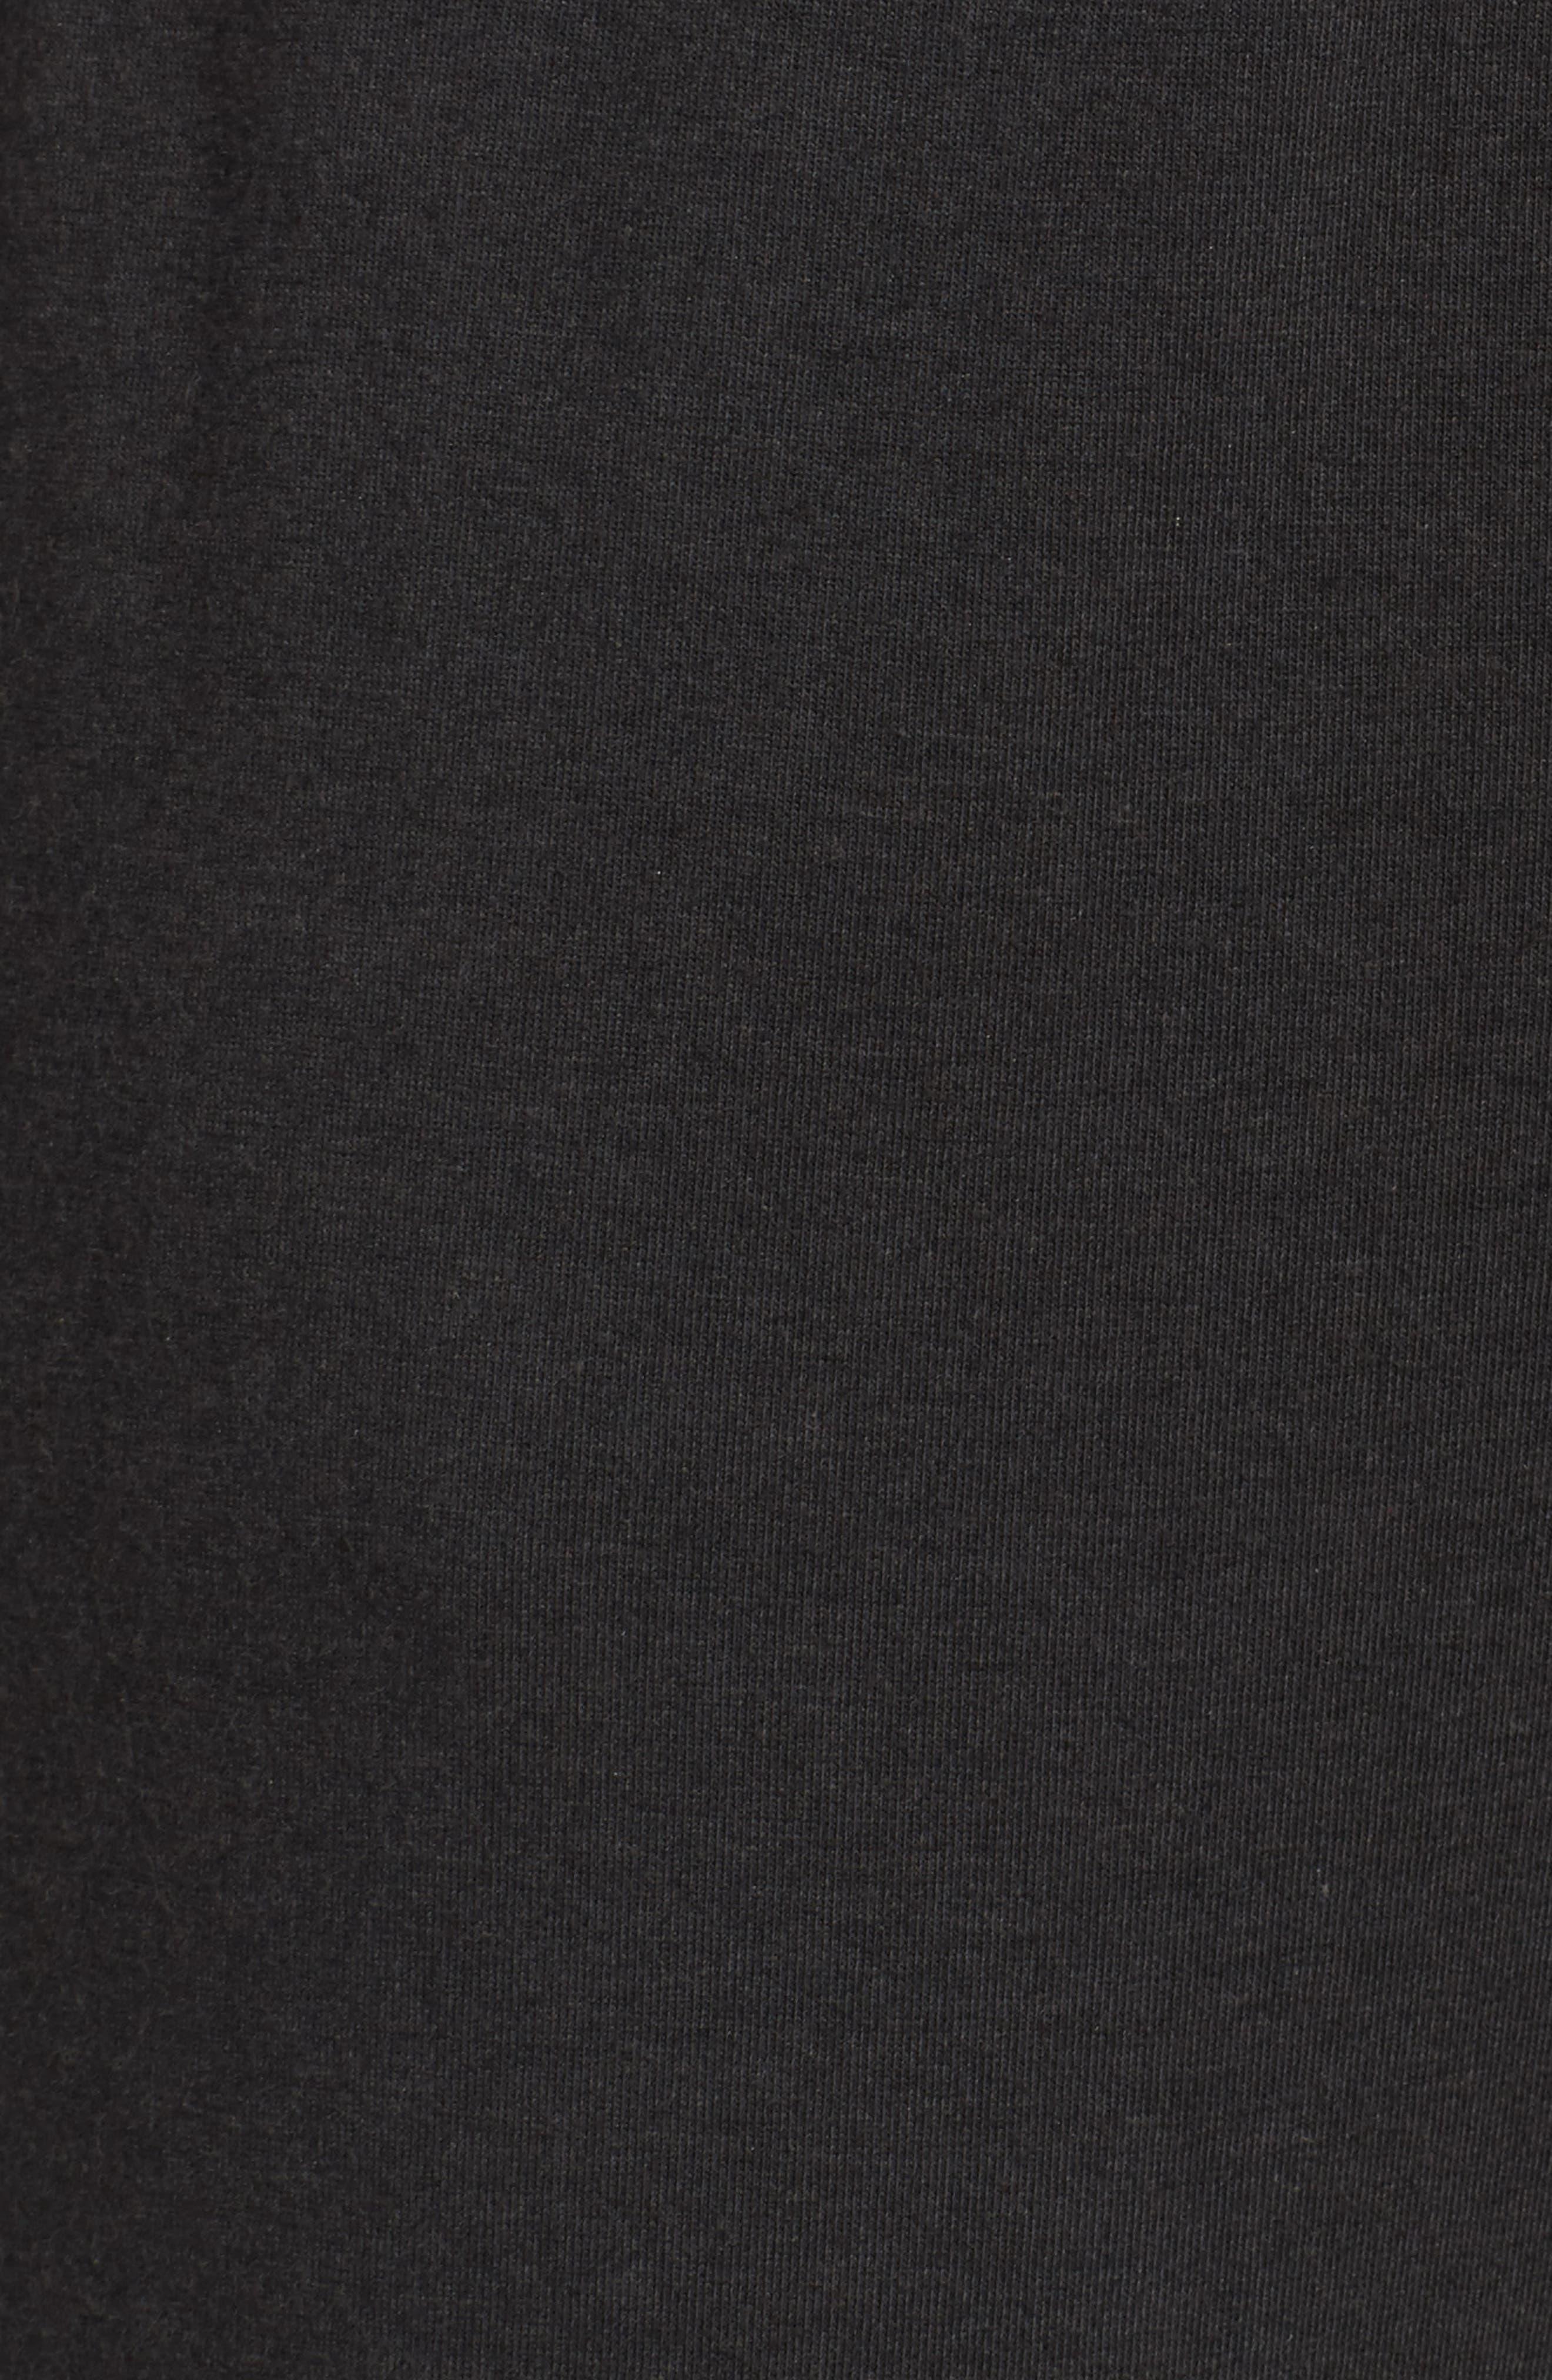 Alice Lounge Pants,                             Alternate thumbnail 6, color,                             Plain Black Marle